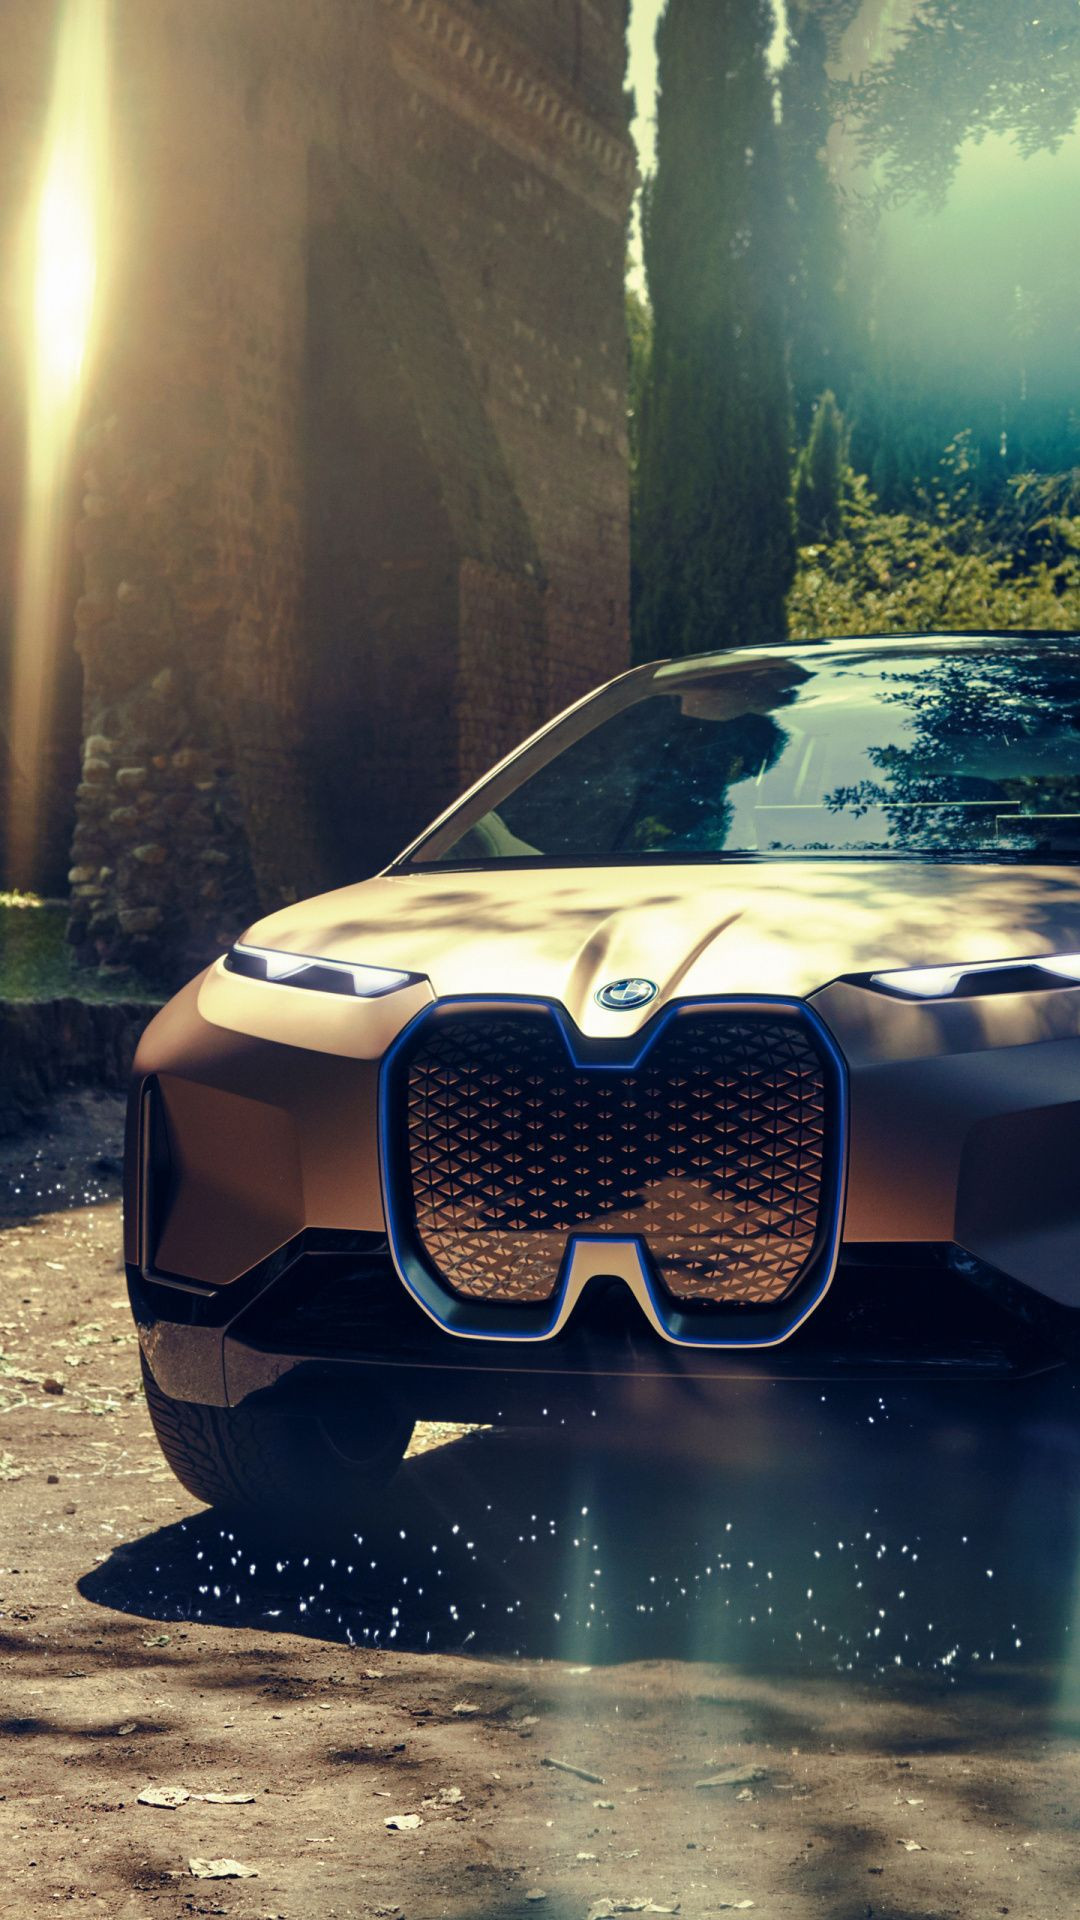 BMW Vision Next 100 Concept Car 1080x1920 Wallpaper